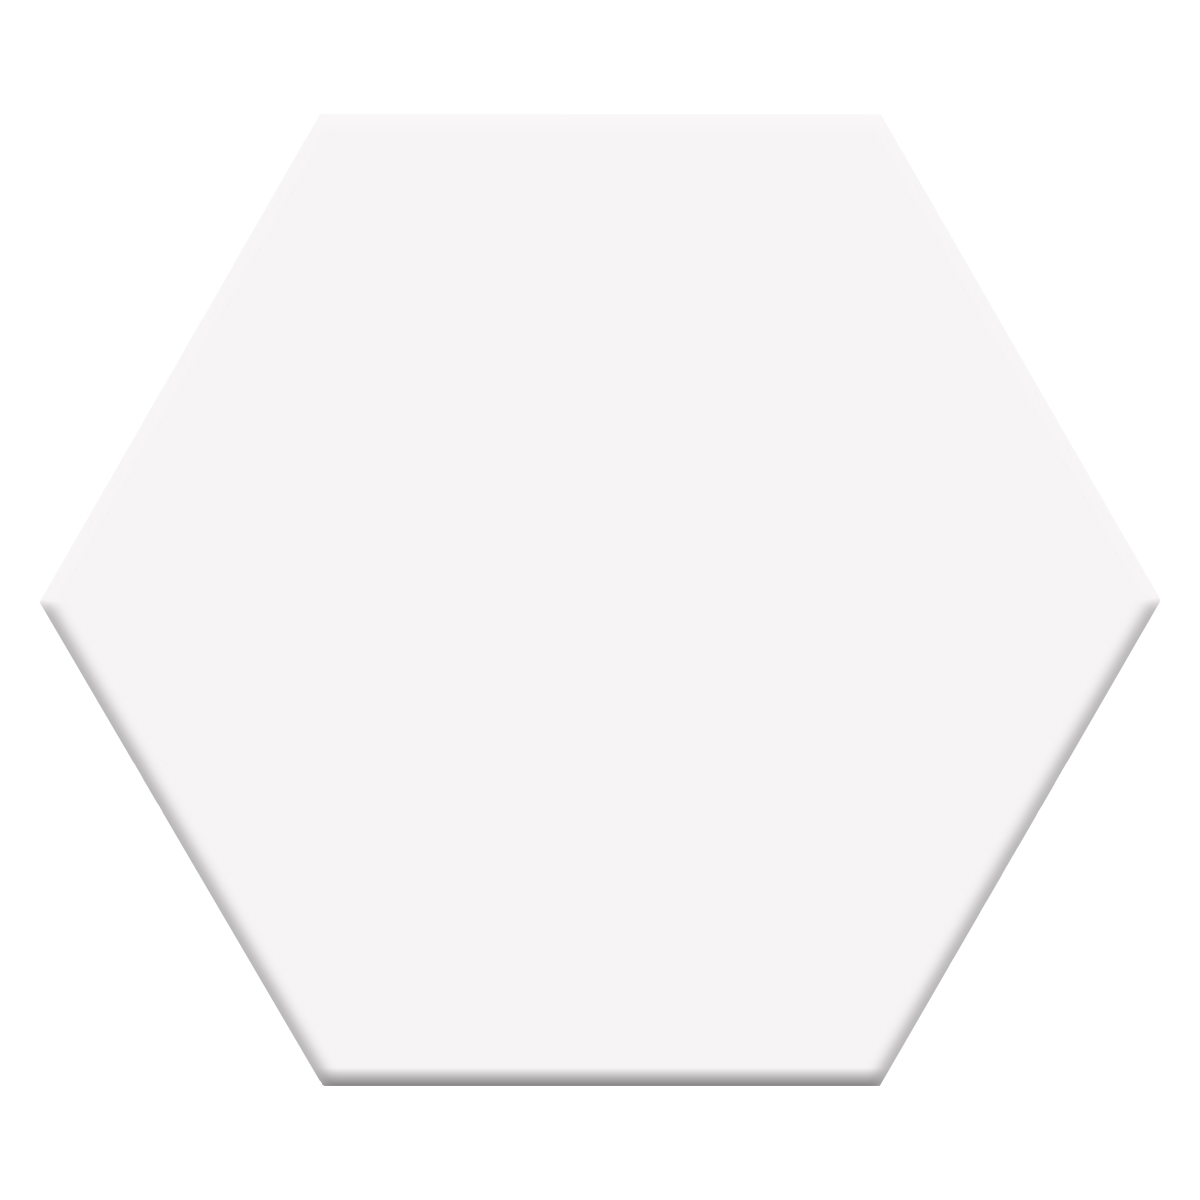 H00001 HEXAGON PURE WHITE P1